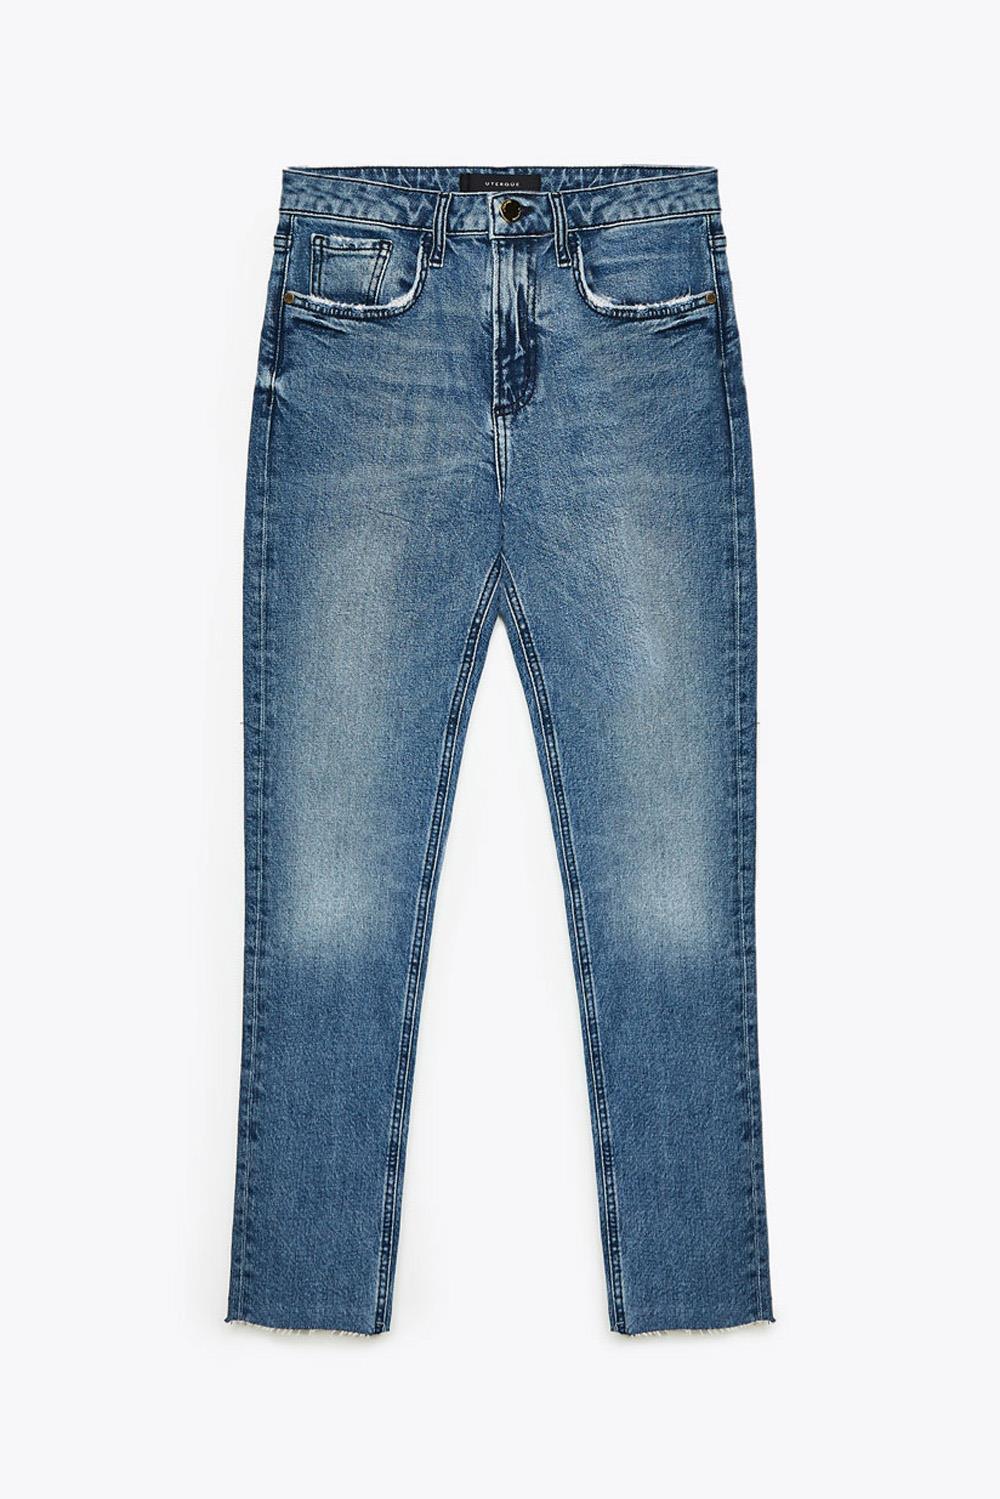 San Francisco 1a665 a4250 Pantalón cropped: los pantalones de moda esta primavera 2019 ...